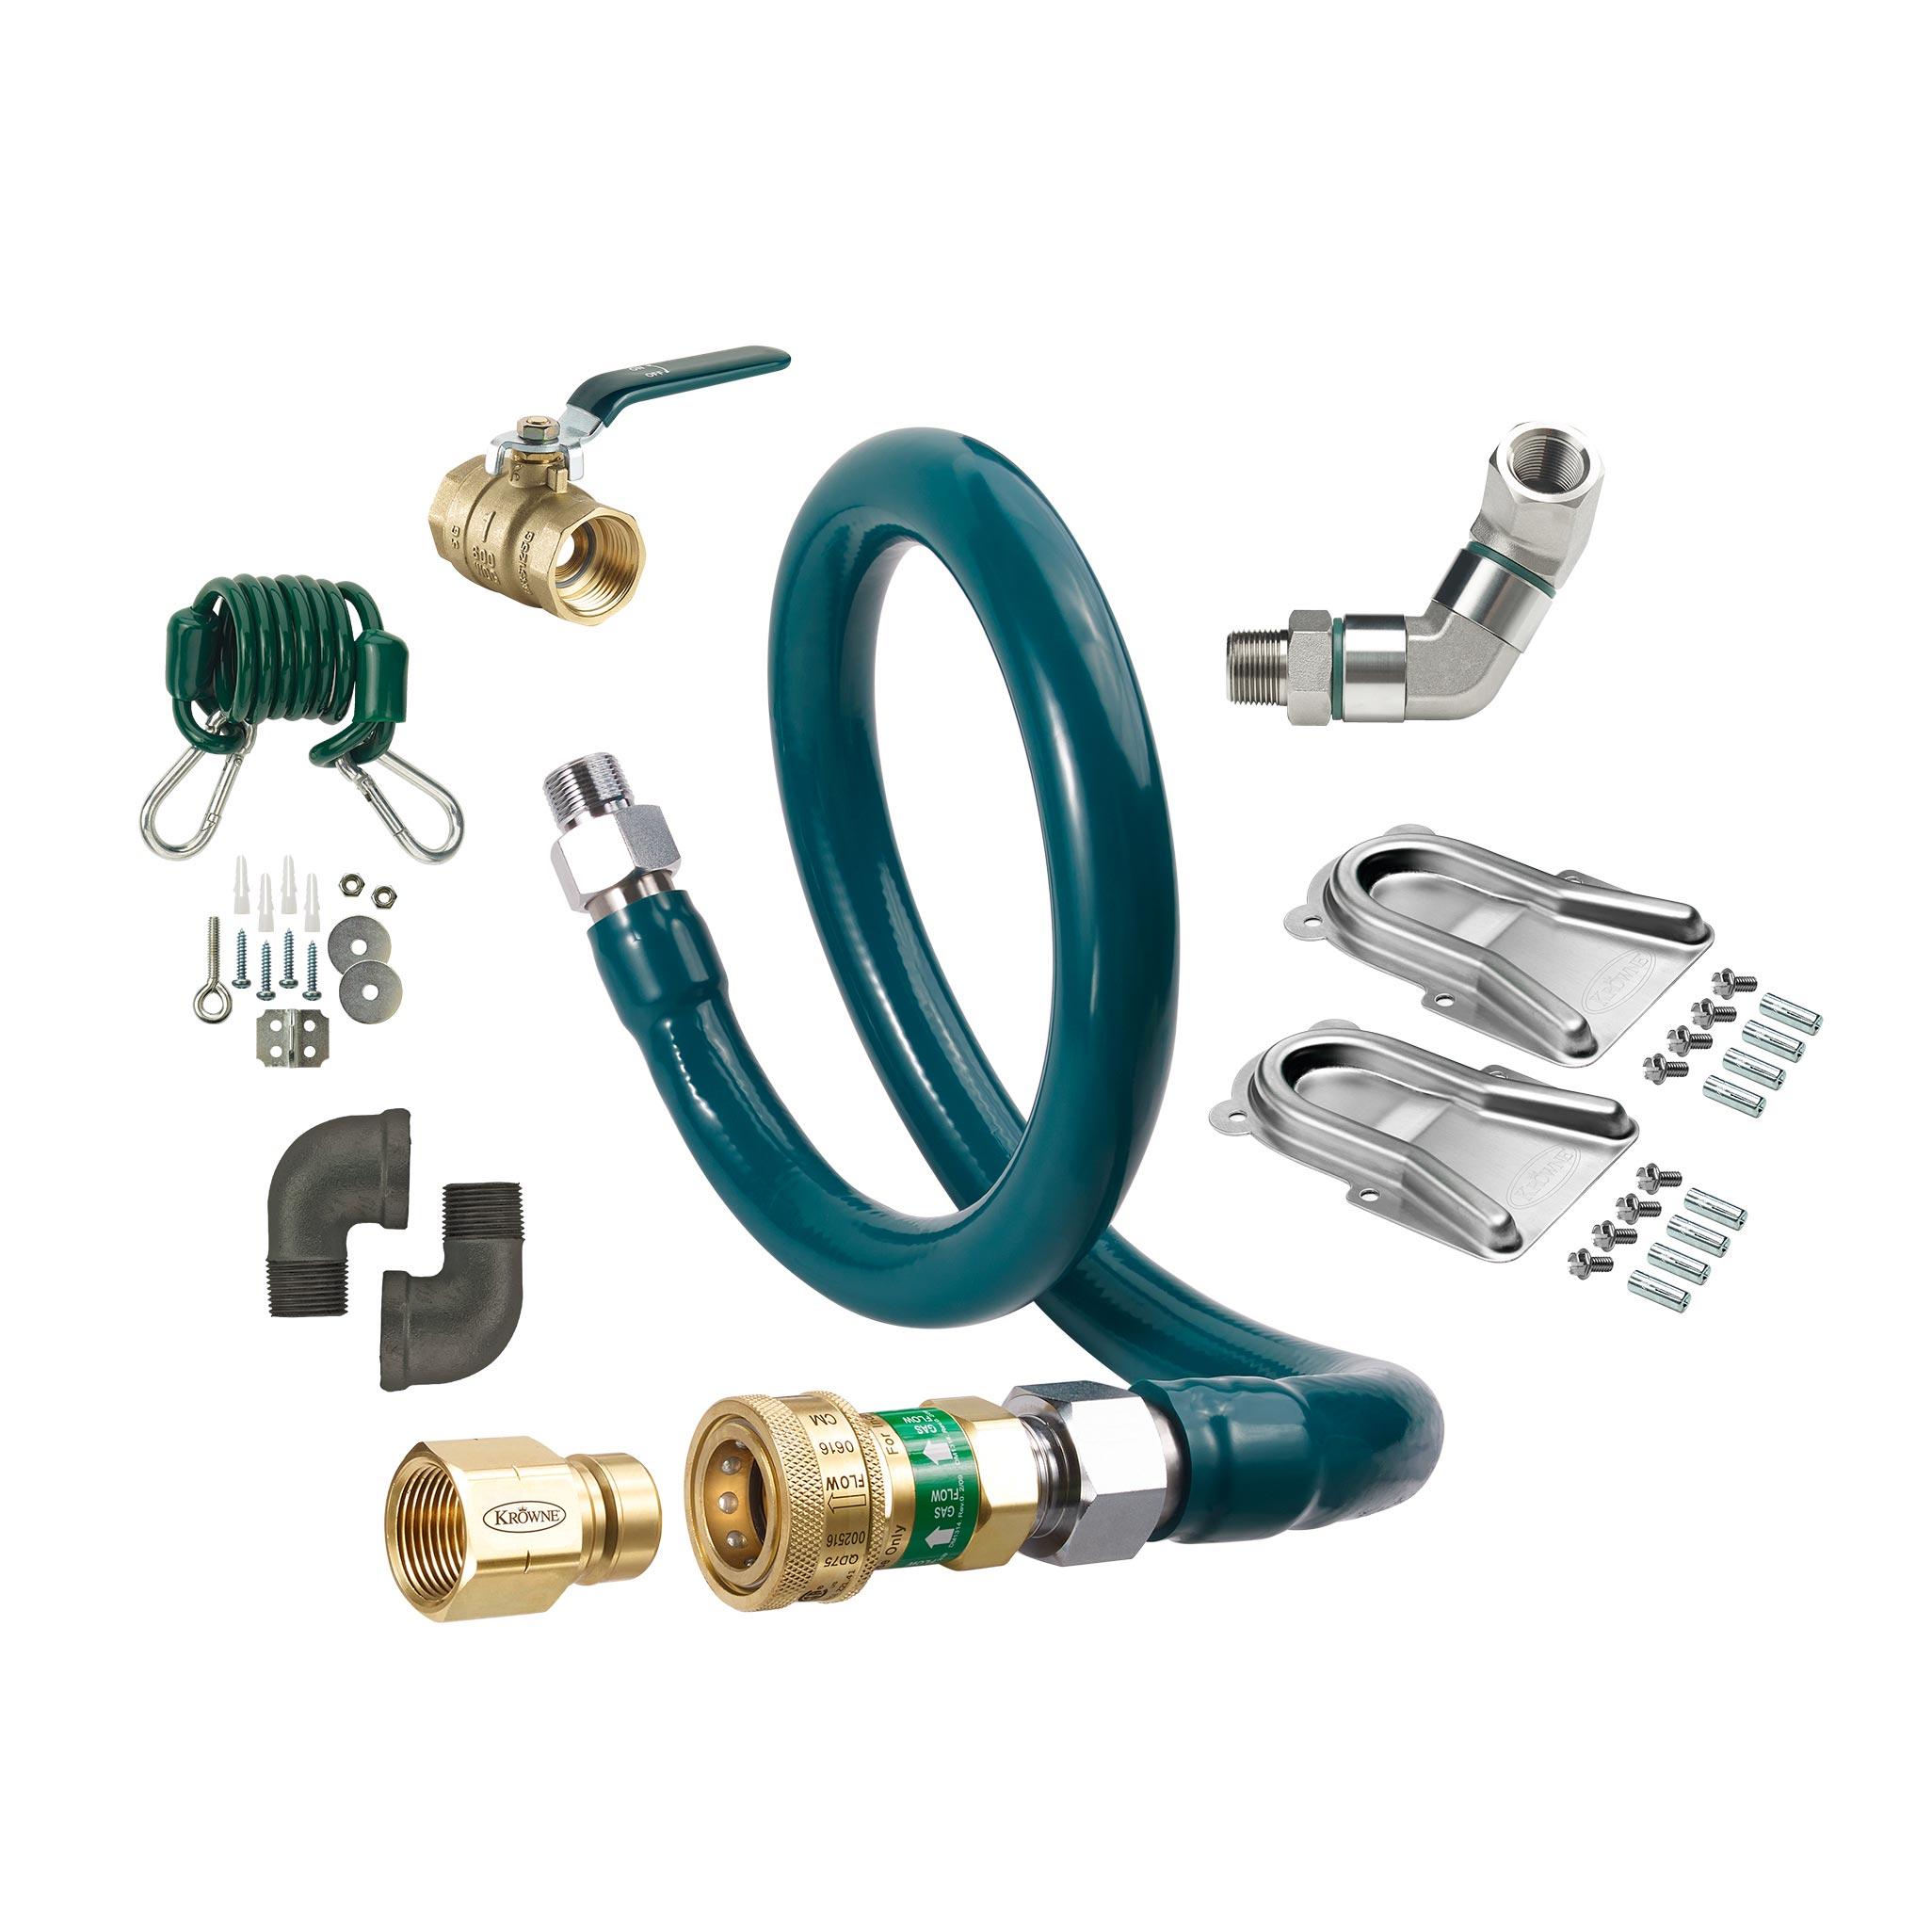 Krowne Metal M10060K11 gas connector hose kit